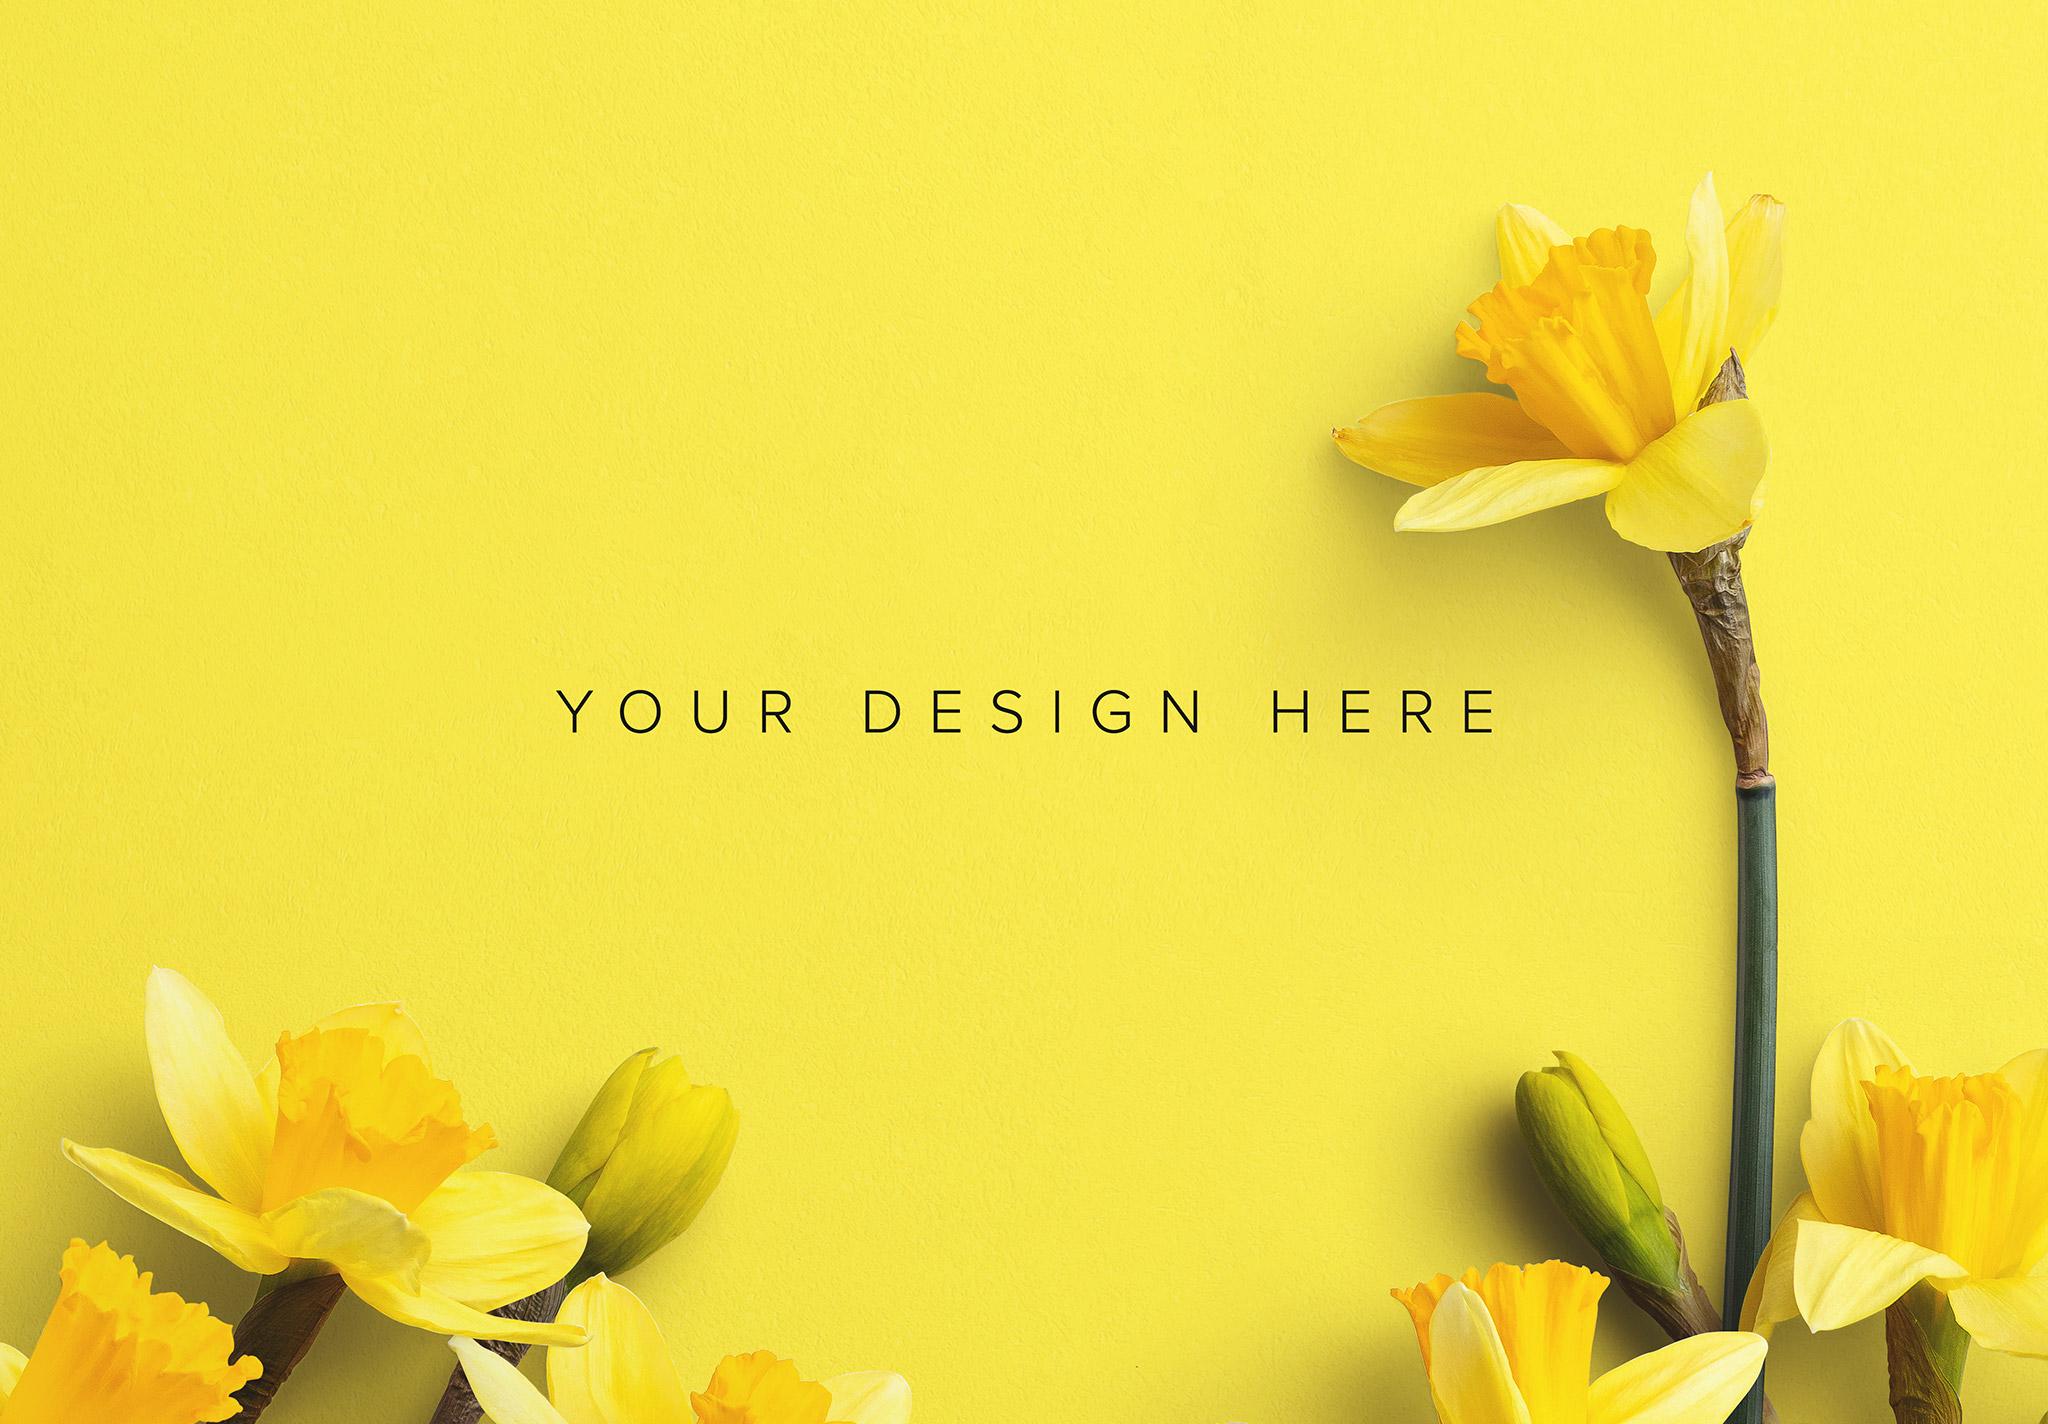 Daffodils Custom Scene Creator Template 2 Image03